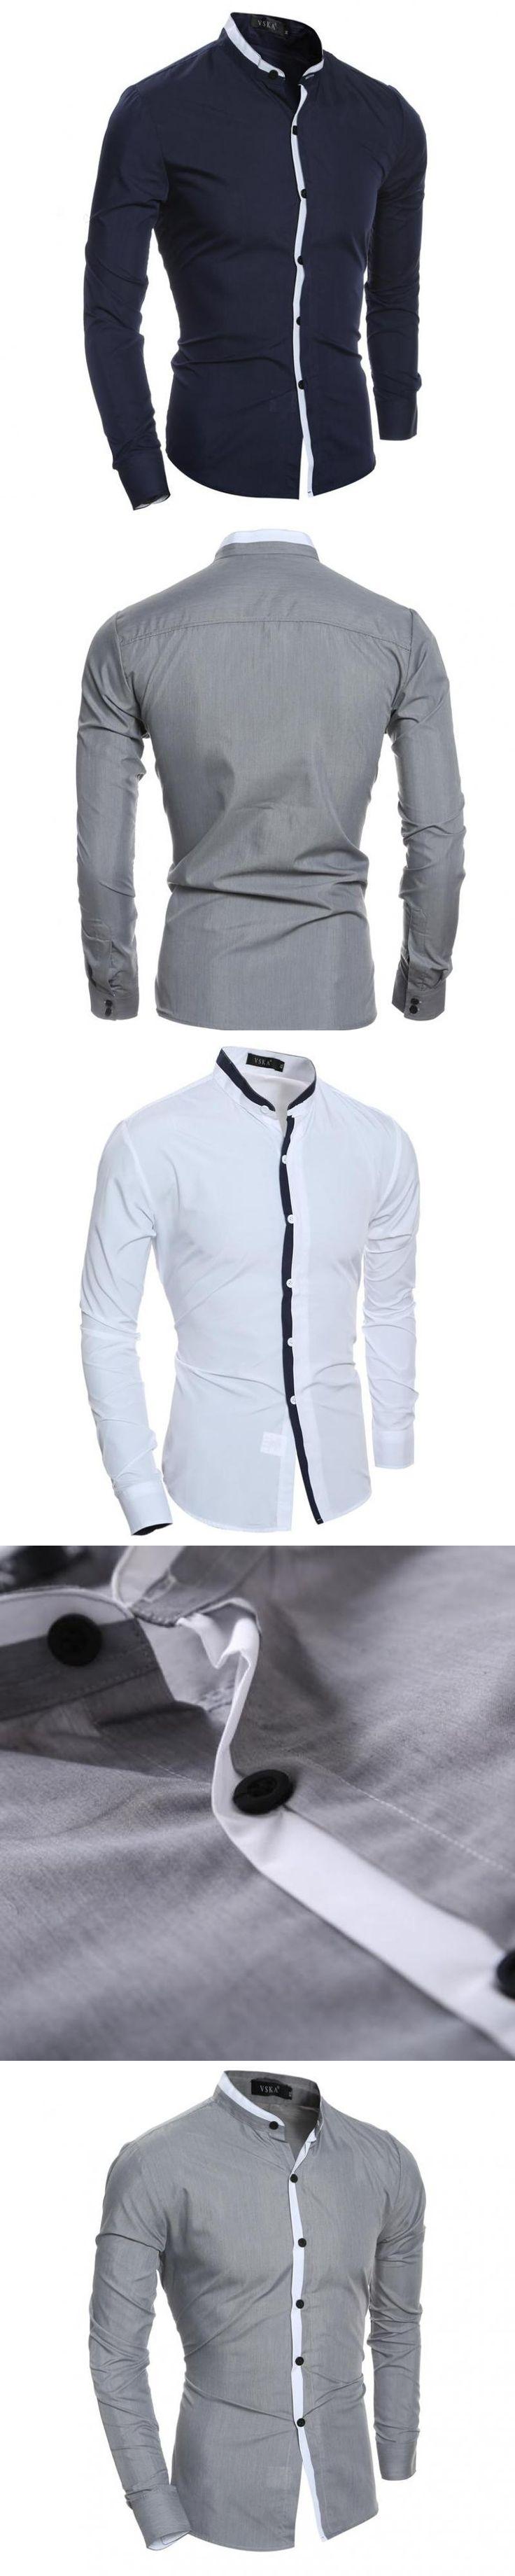 ZEESHANT Men Long Sleeve 2017 Brand Male Slim Fit Fashion Spell Color Chemise Mens Camisas Dress Shirt in Men's Tuxedo Shirts